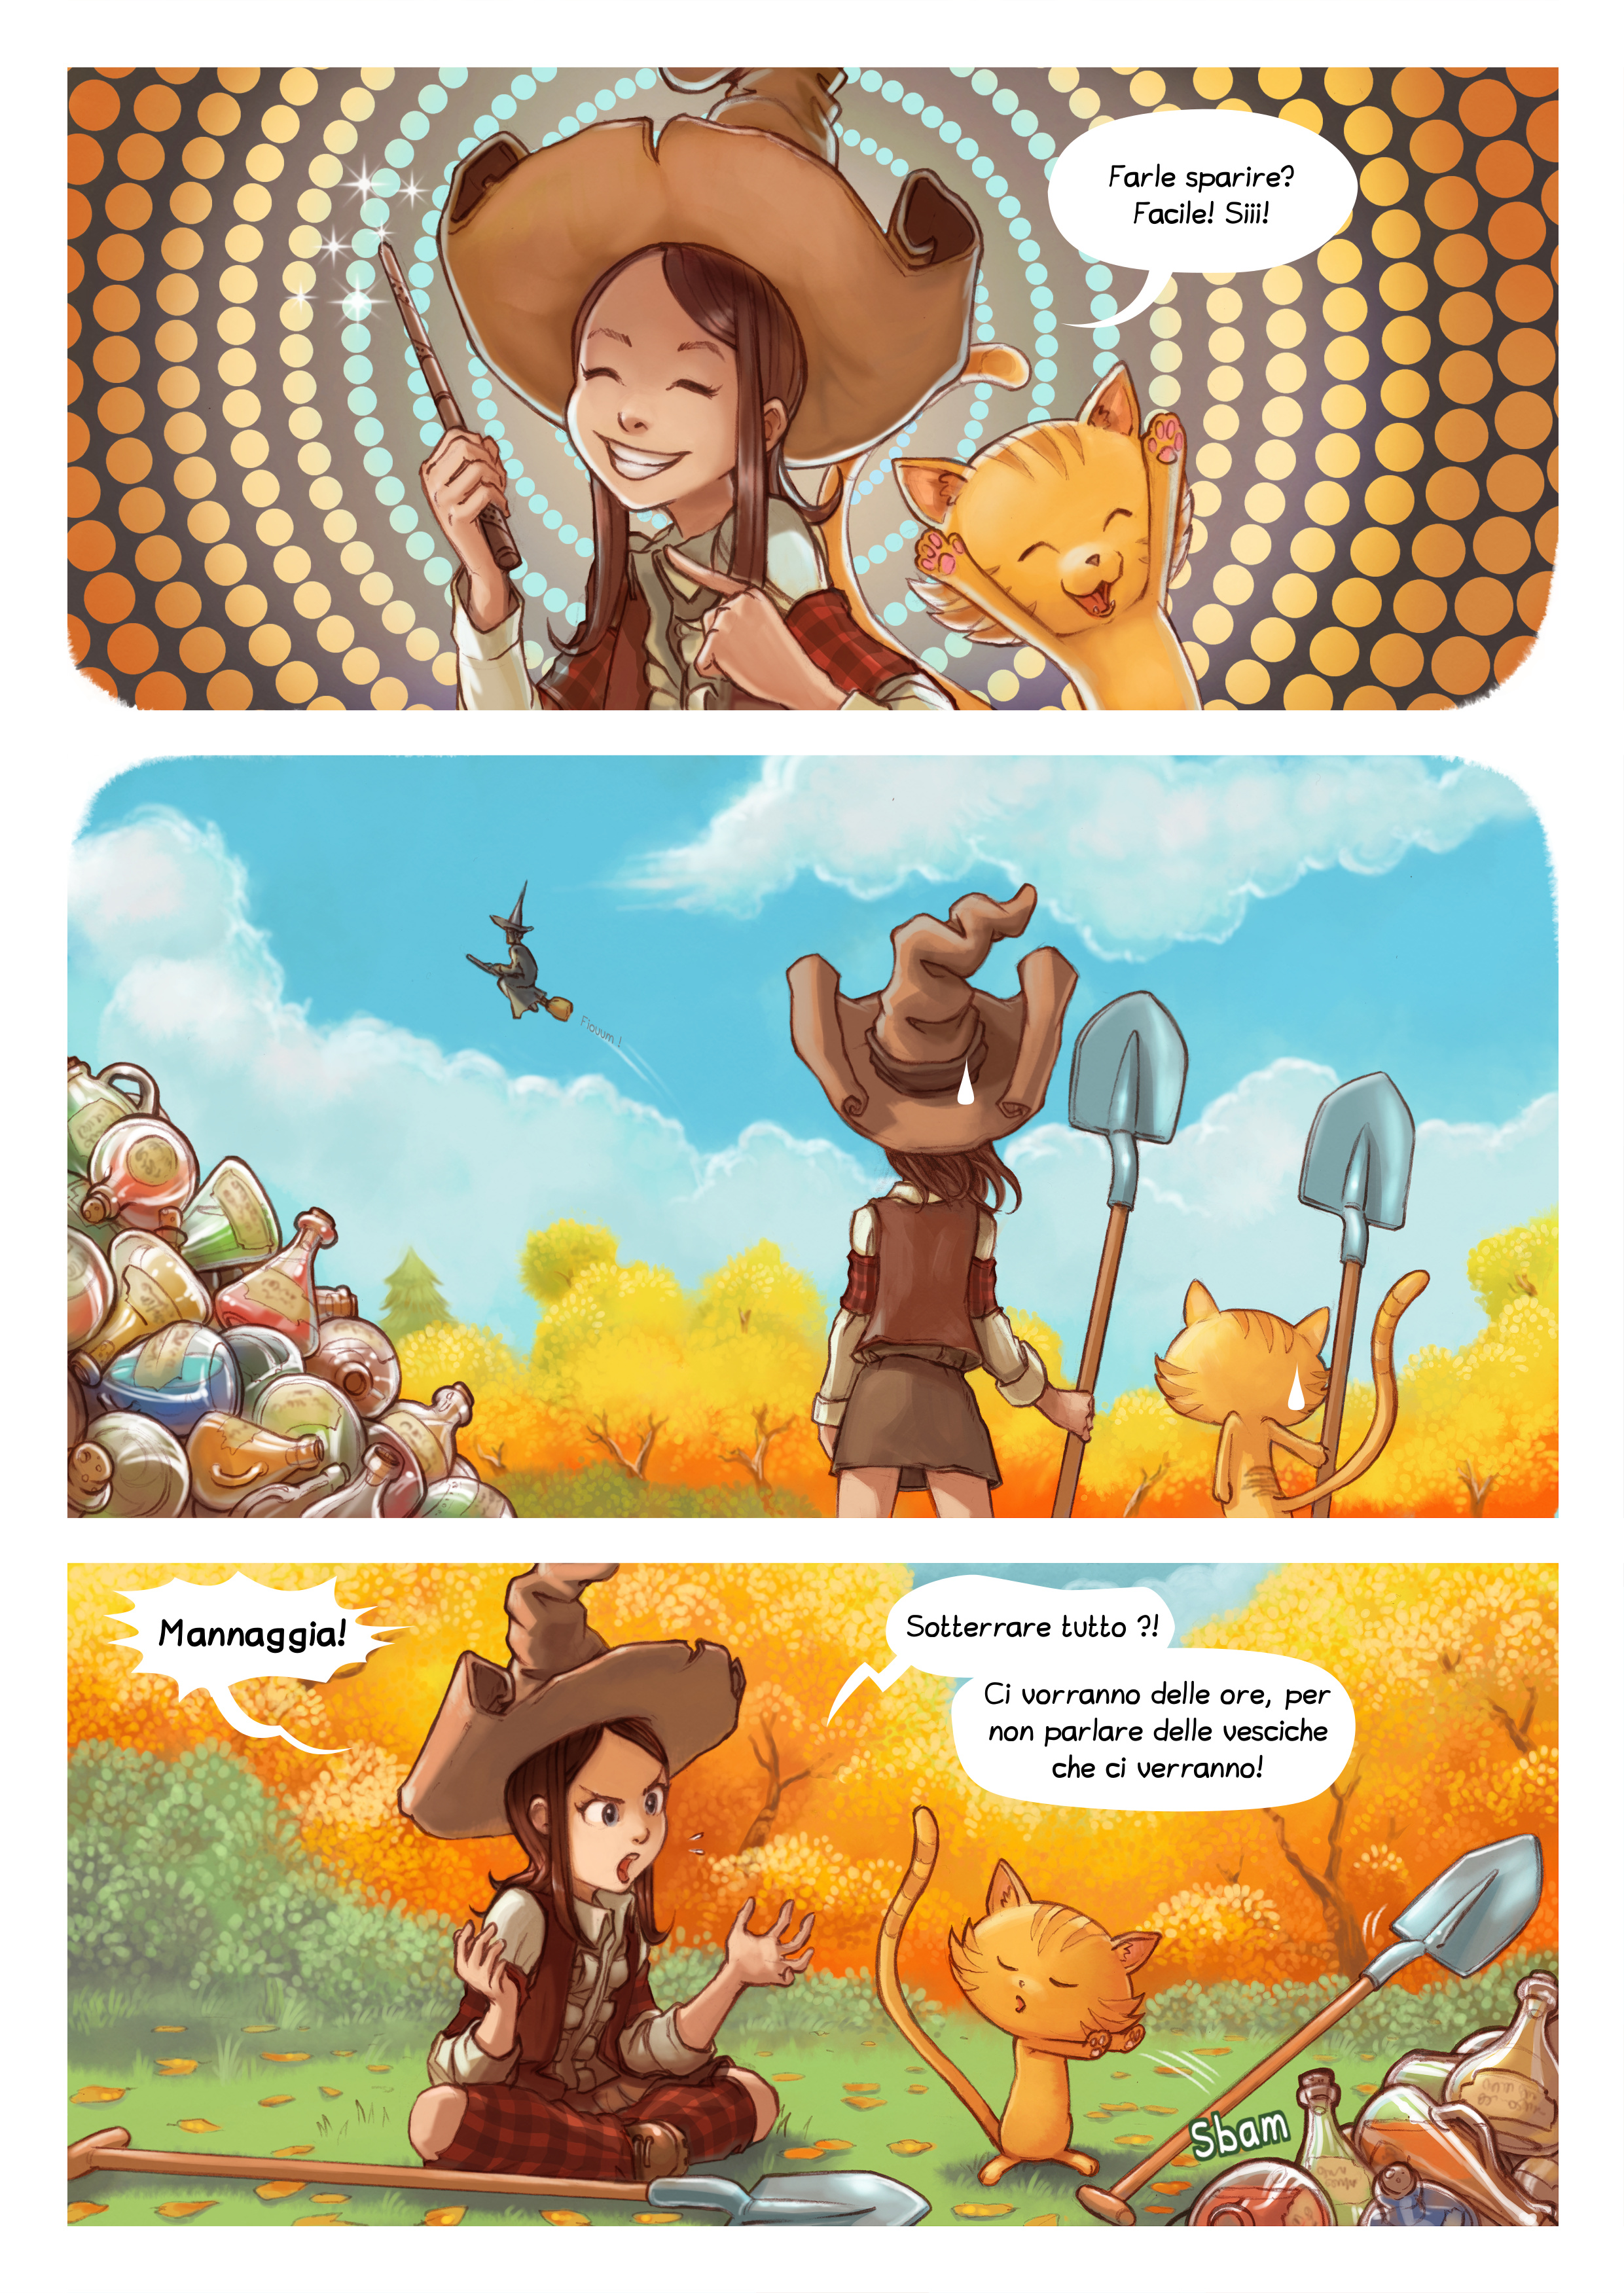 Episodio 12: Pulizie d'autunno, Page 2